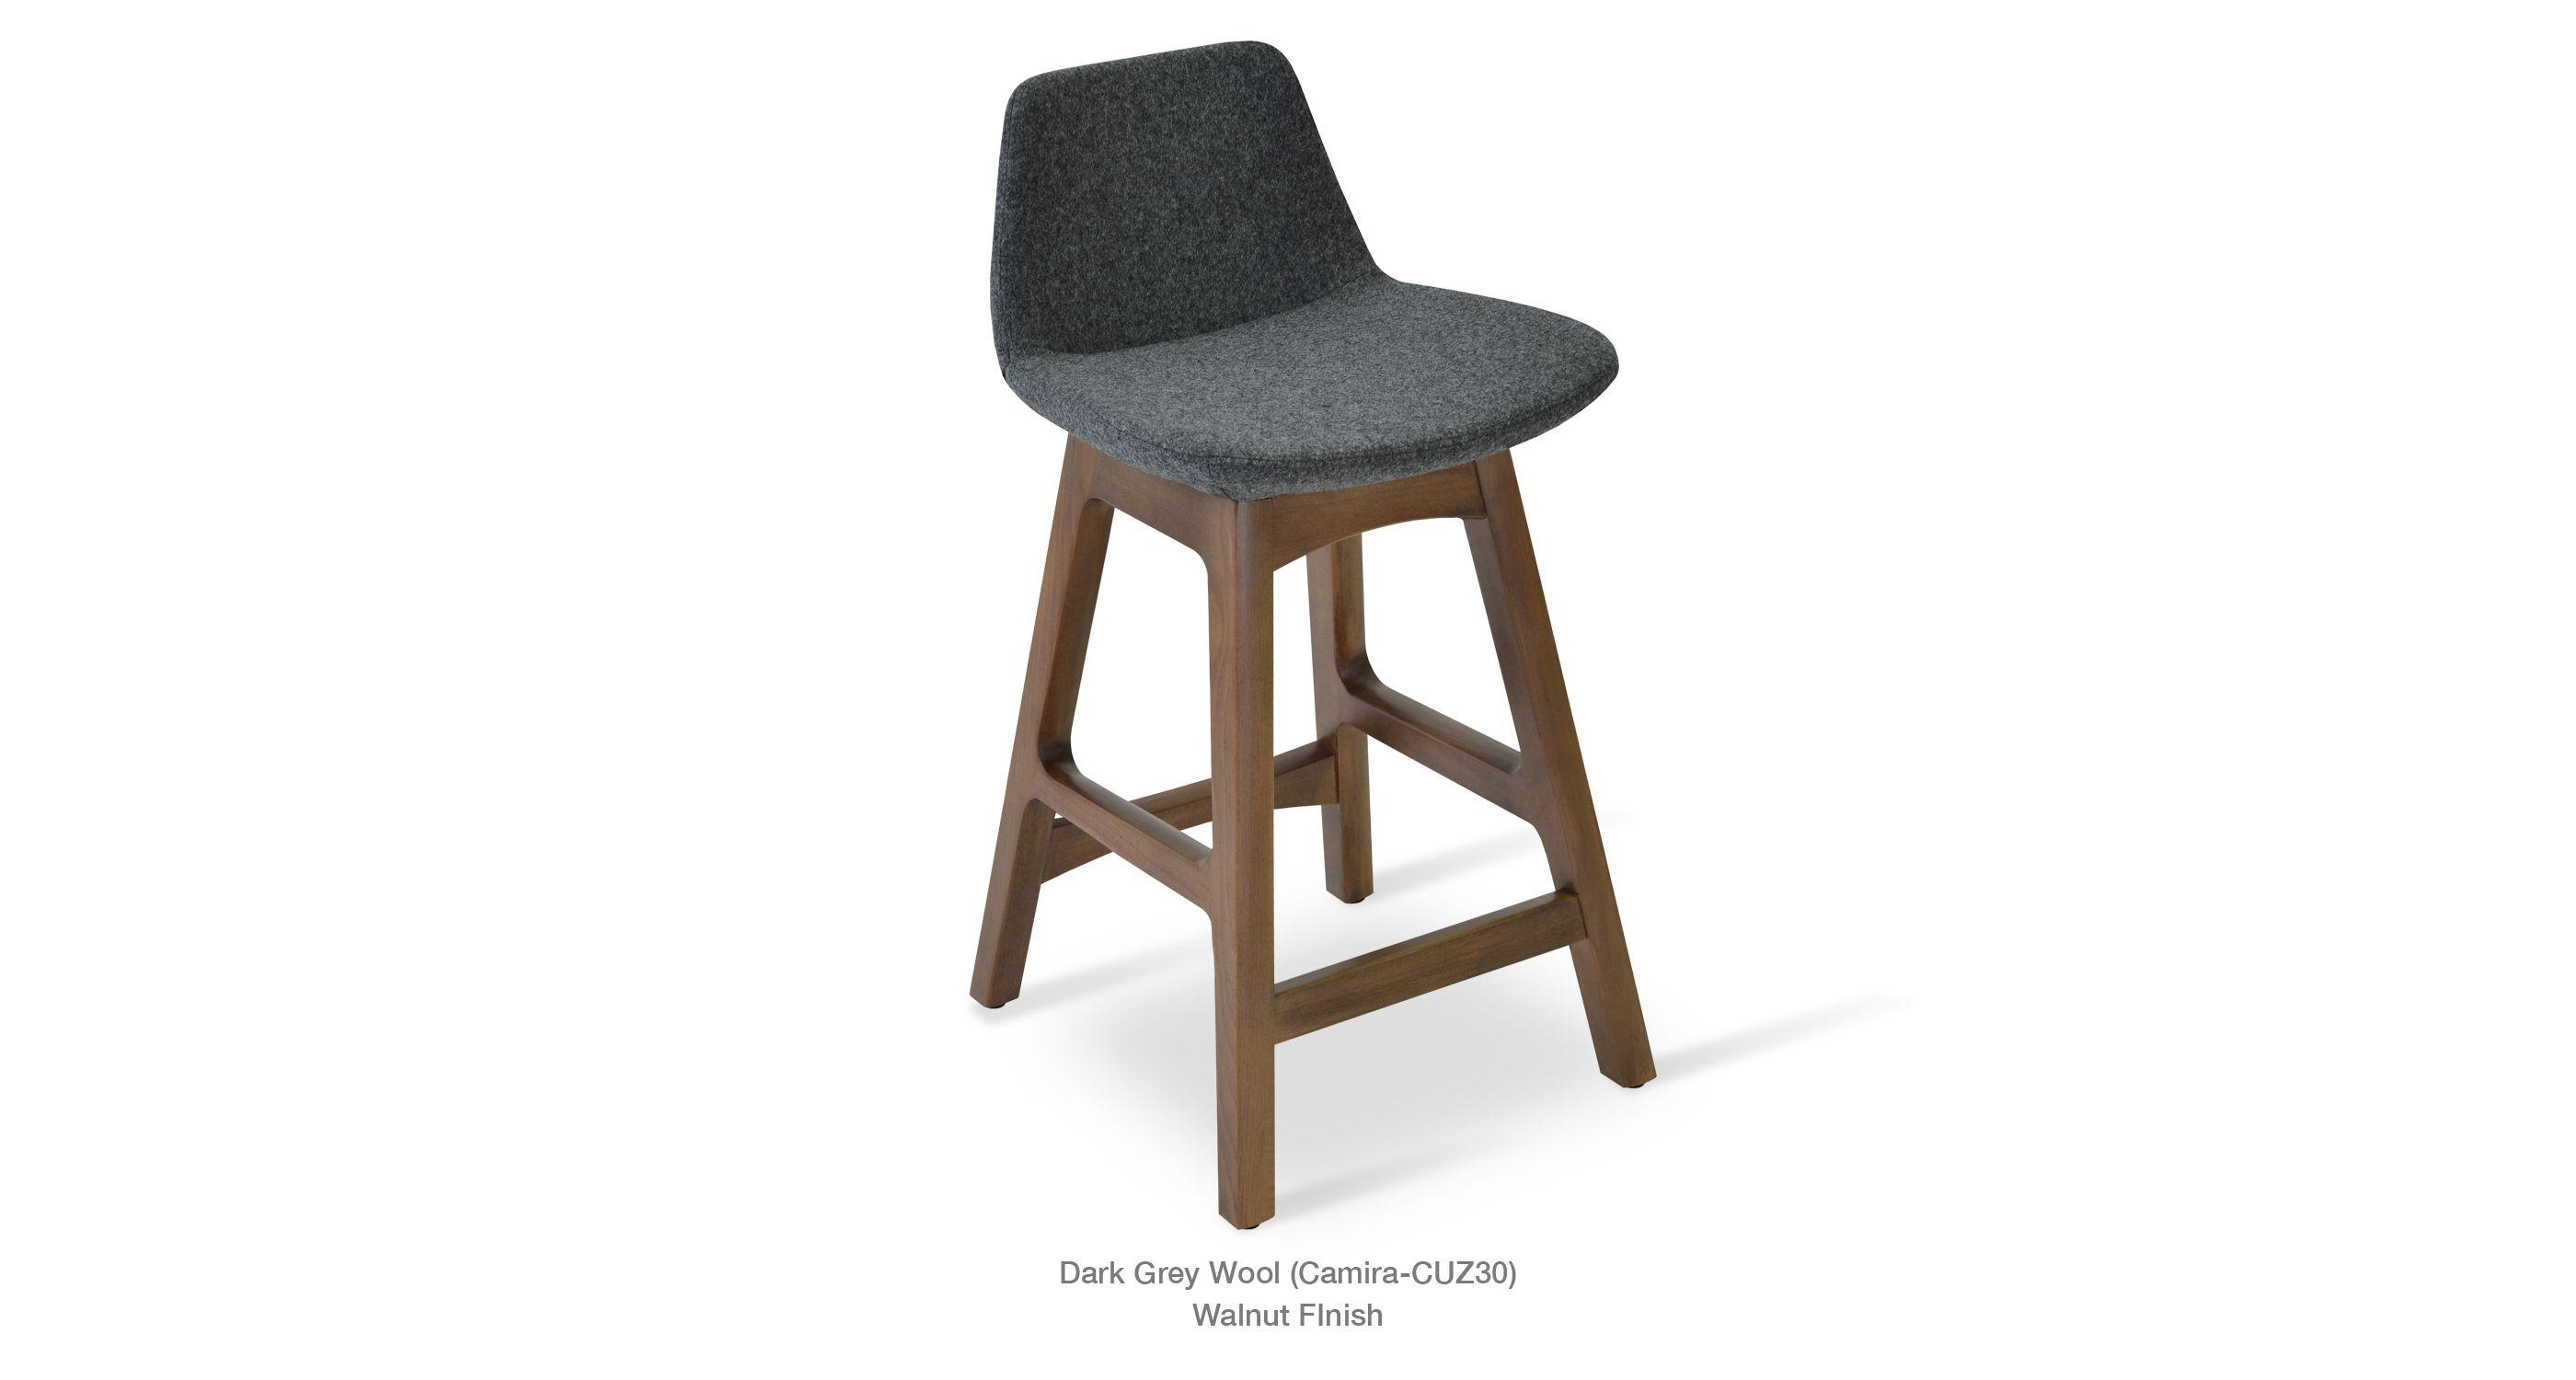 Phenomenal Pera Wood Dark Grey Furnishings Counter Bar Stools Bar Inzonedesignstudio Interior Chair Design Inzonedesignstudiocom